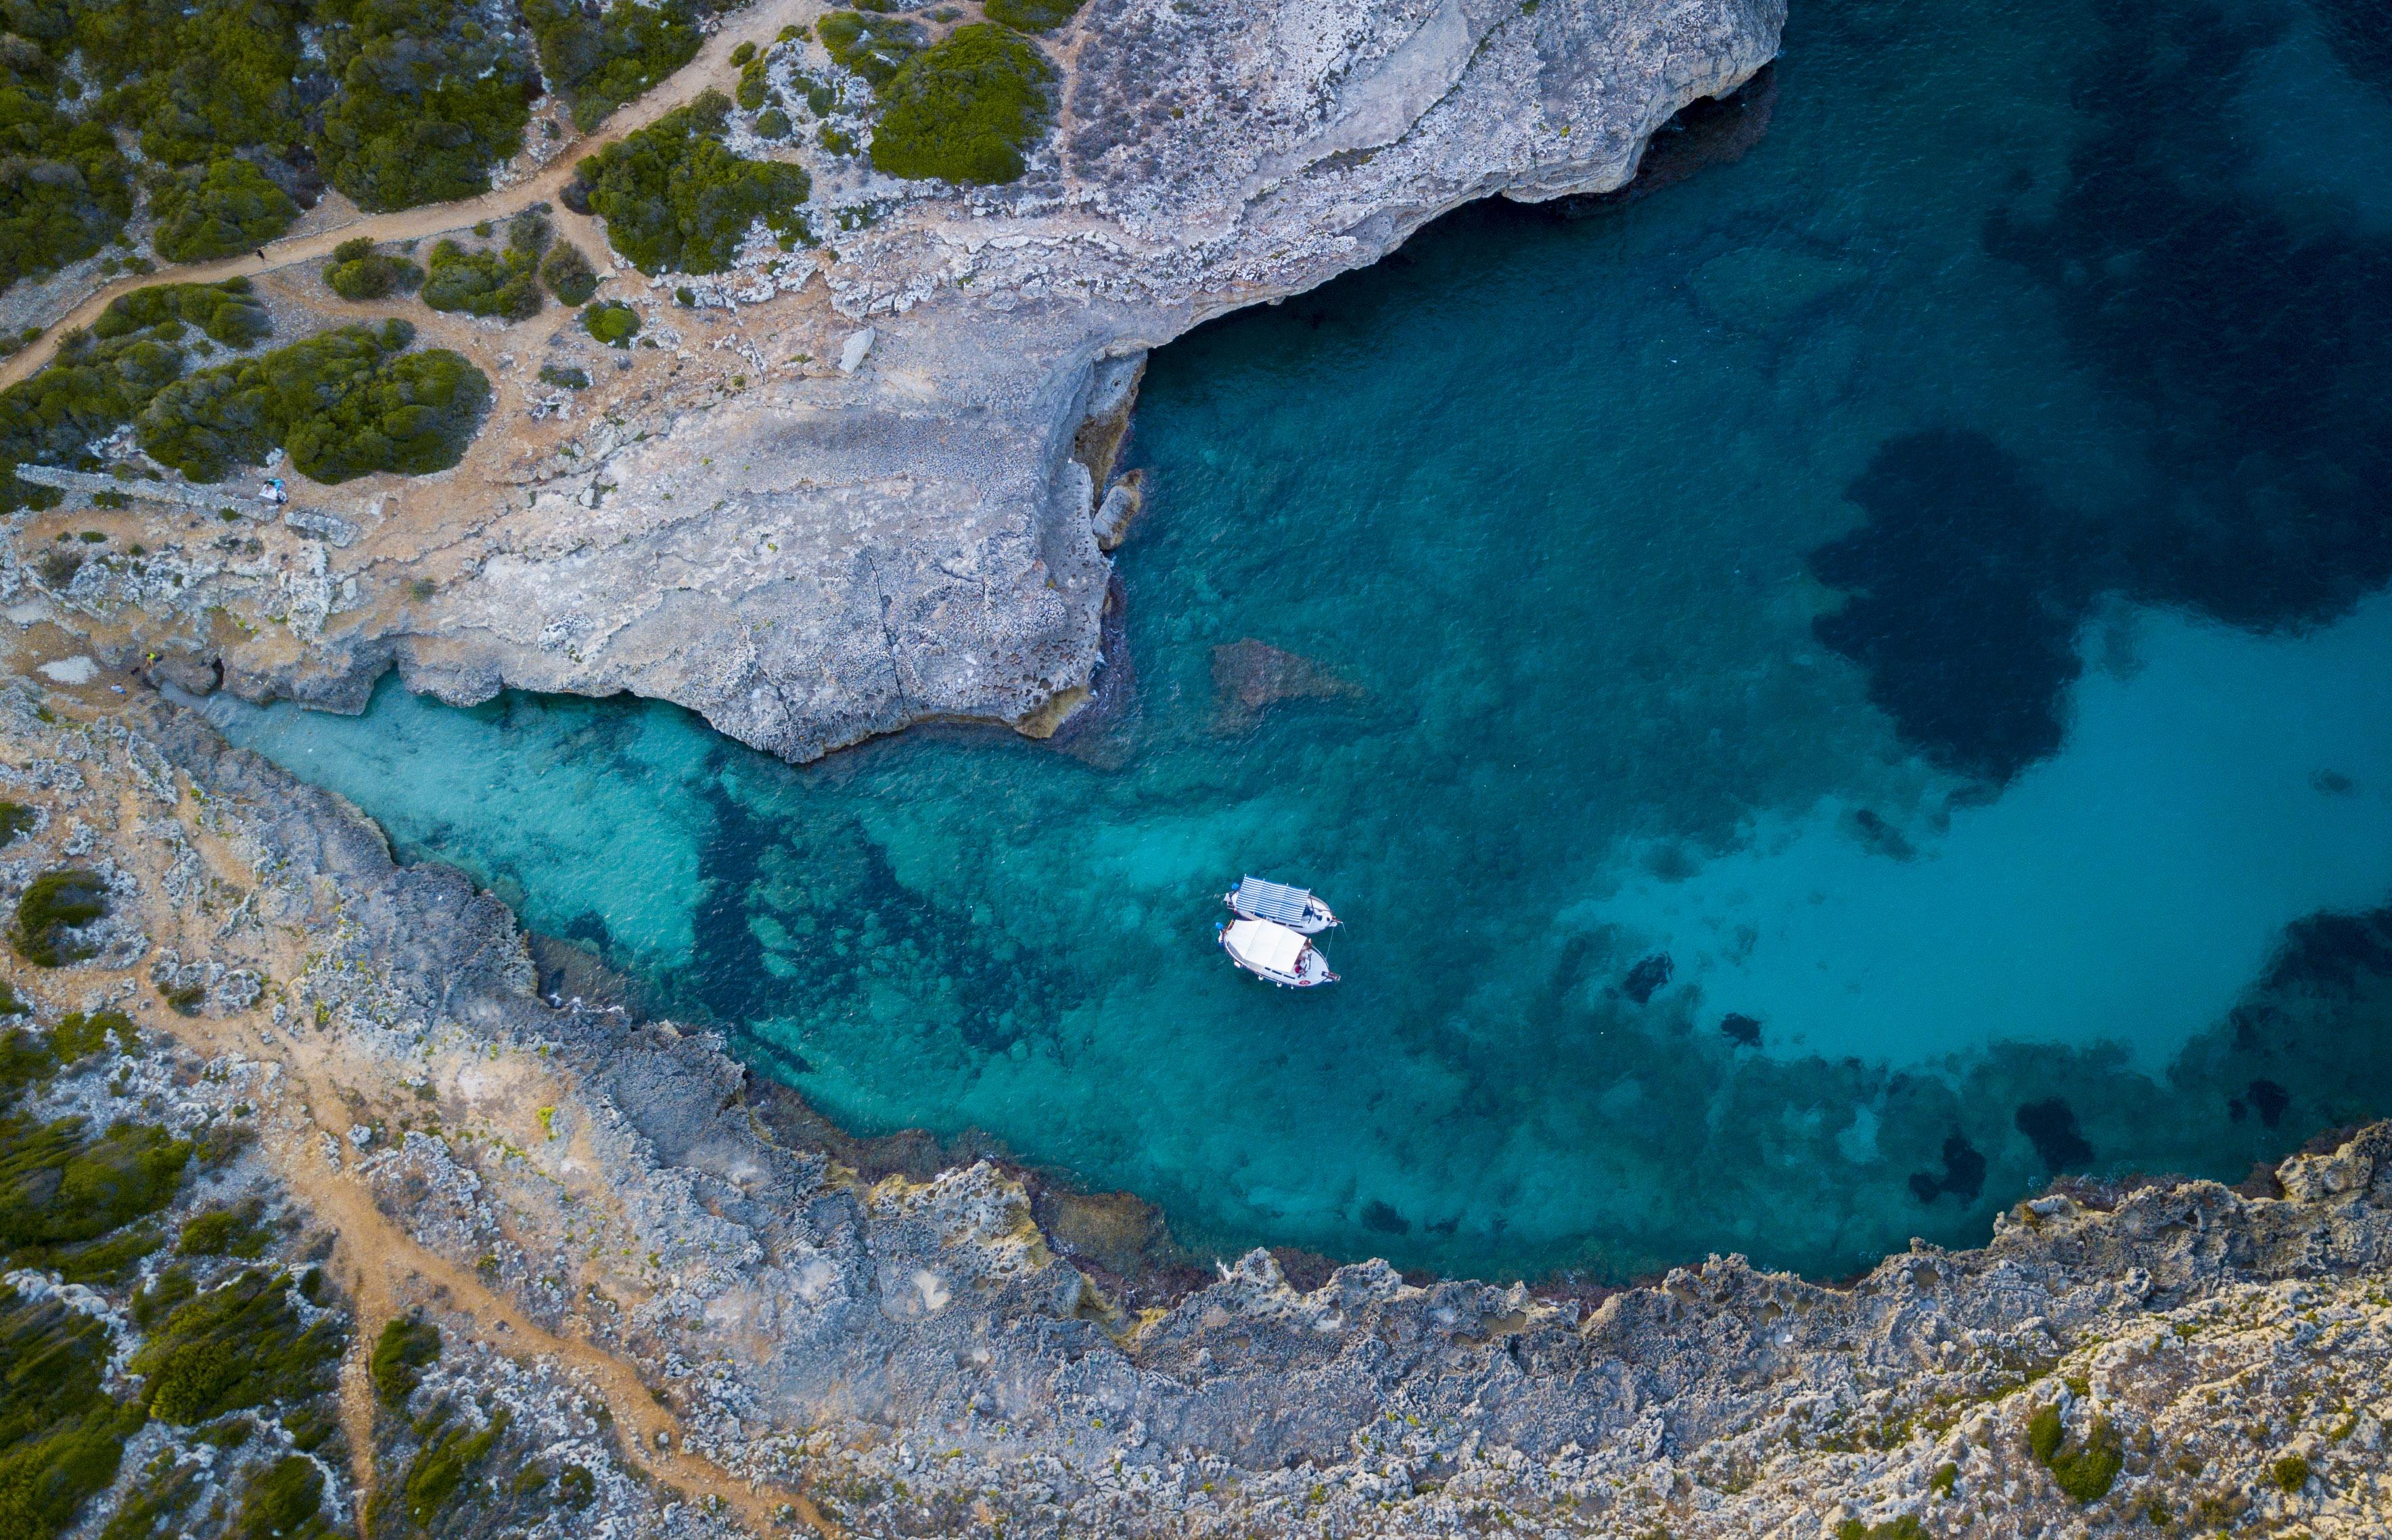 Boats In a Cove